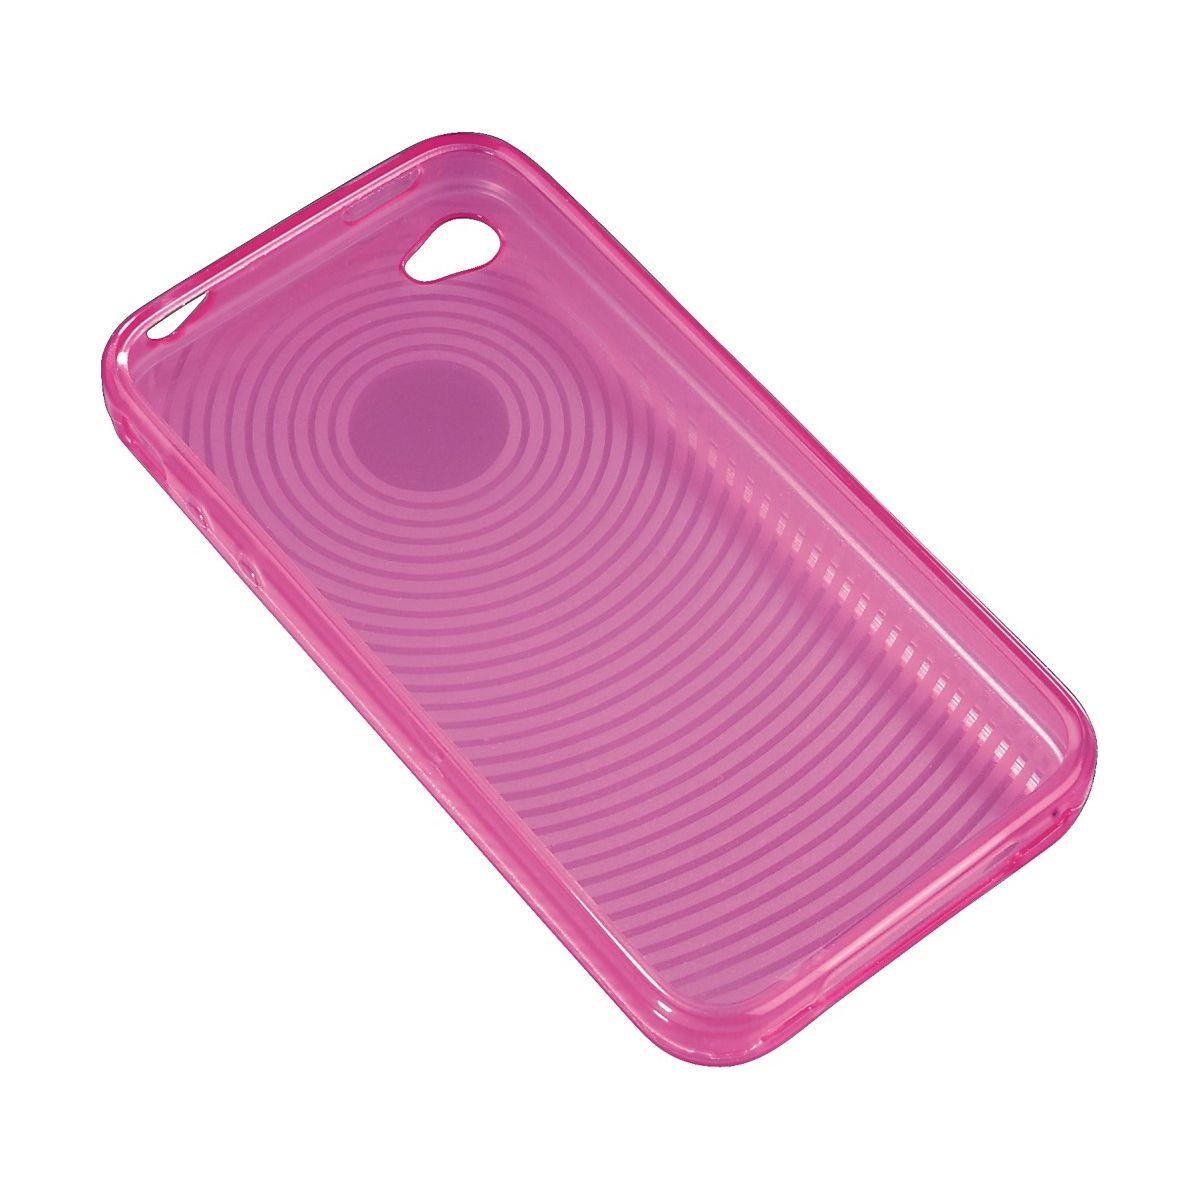 Coque hama 107108 coque spirale rose iphone 4/4s - 10% de remise immédiate avec le code : multi10